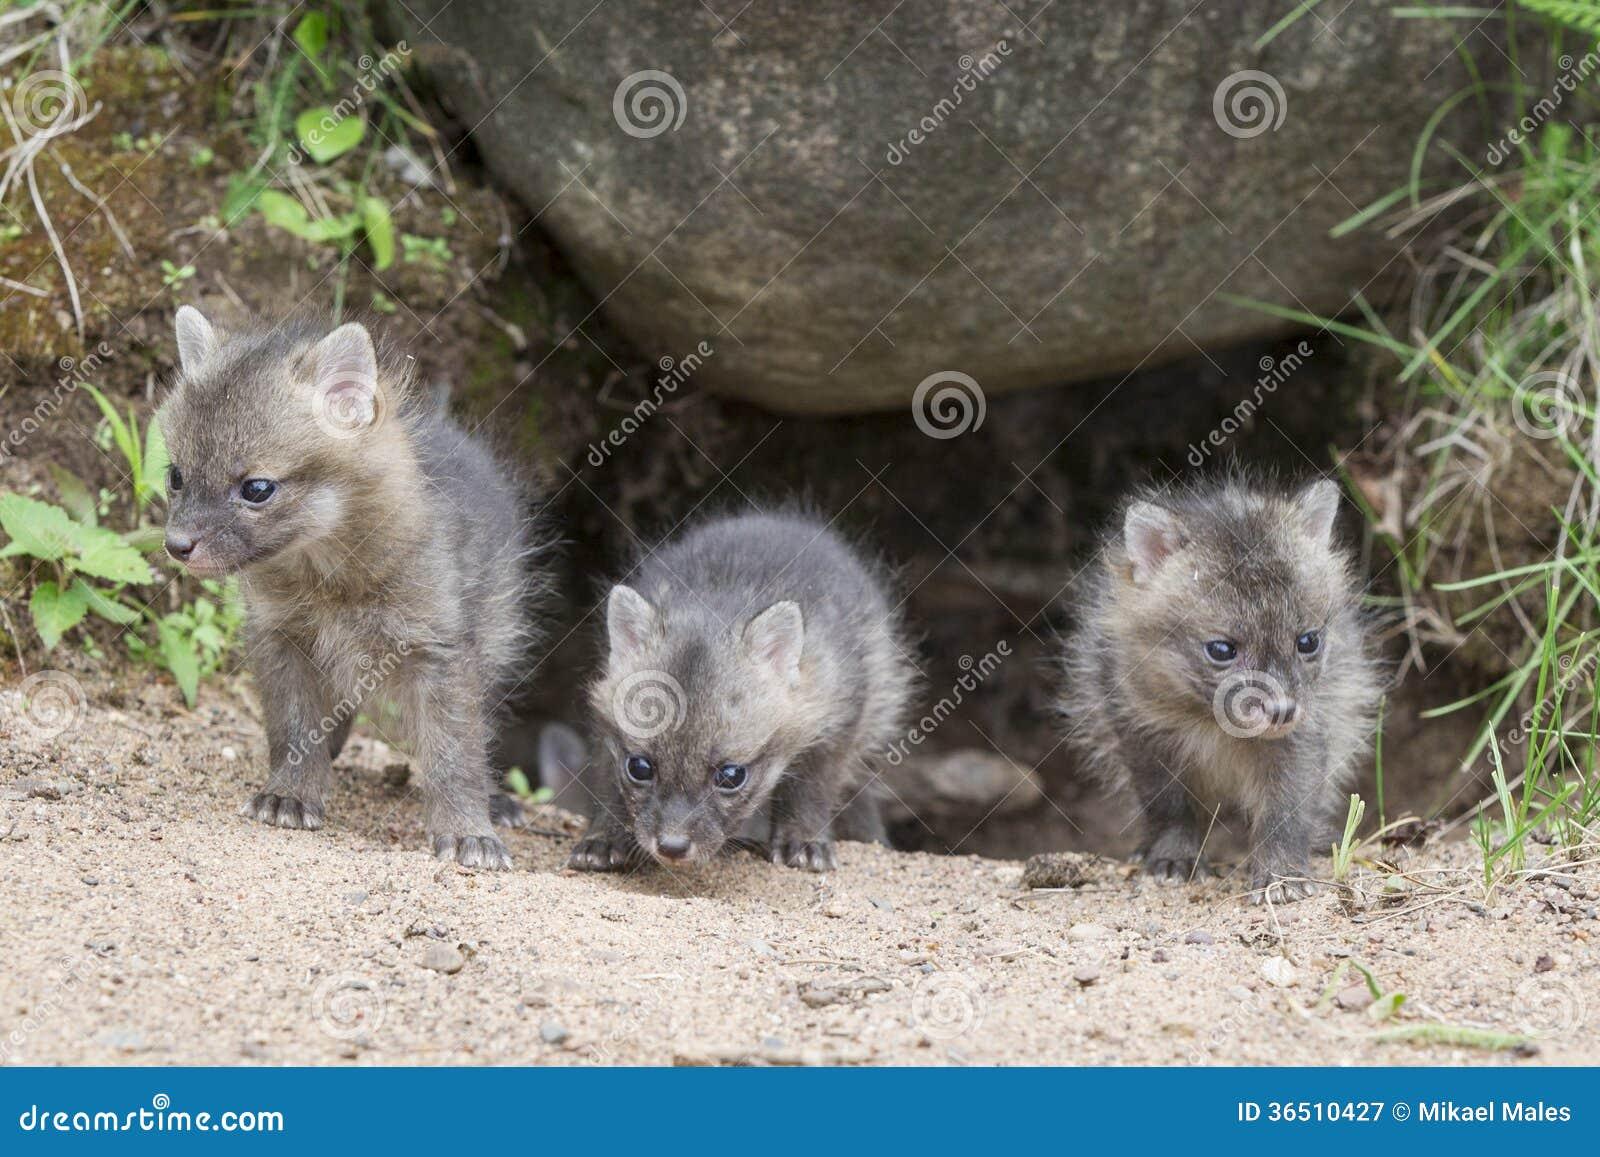 Grey Fox Kits